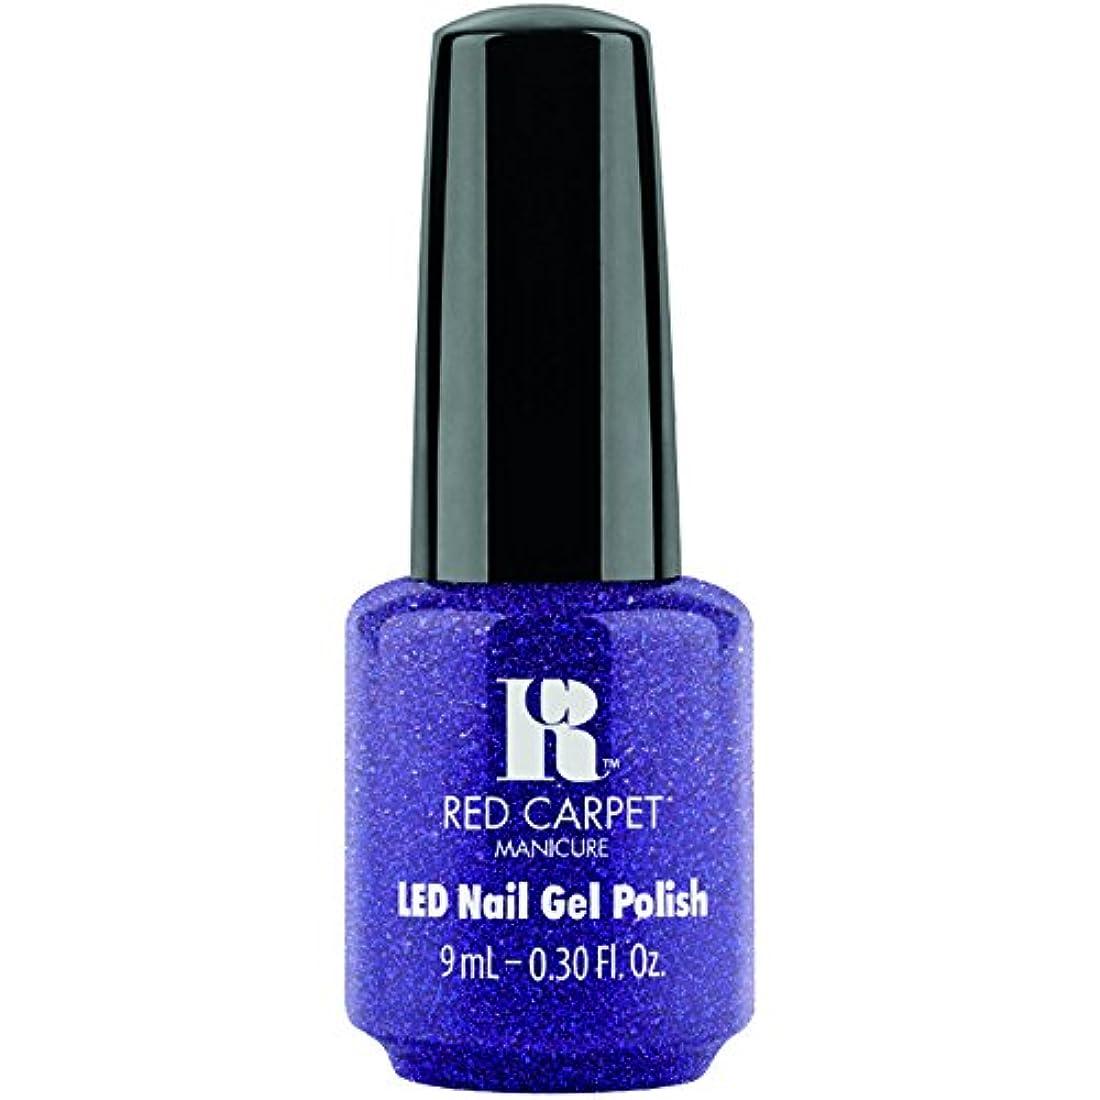 Red Carpet Manicure - LED Nail Gel Polish - Throw Some Glitter On It - 0.3oz / 9ml